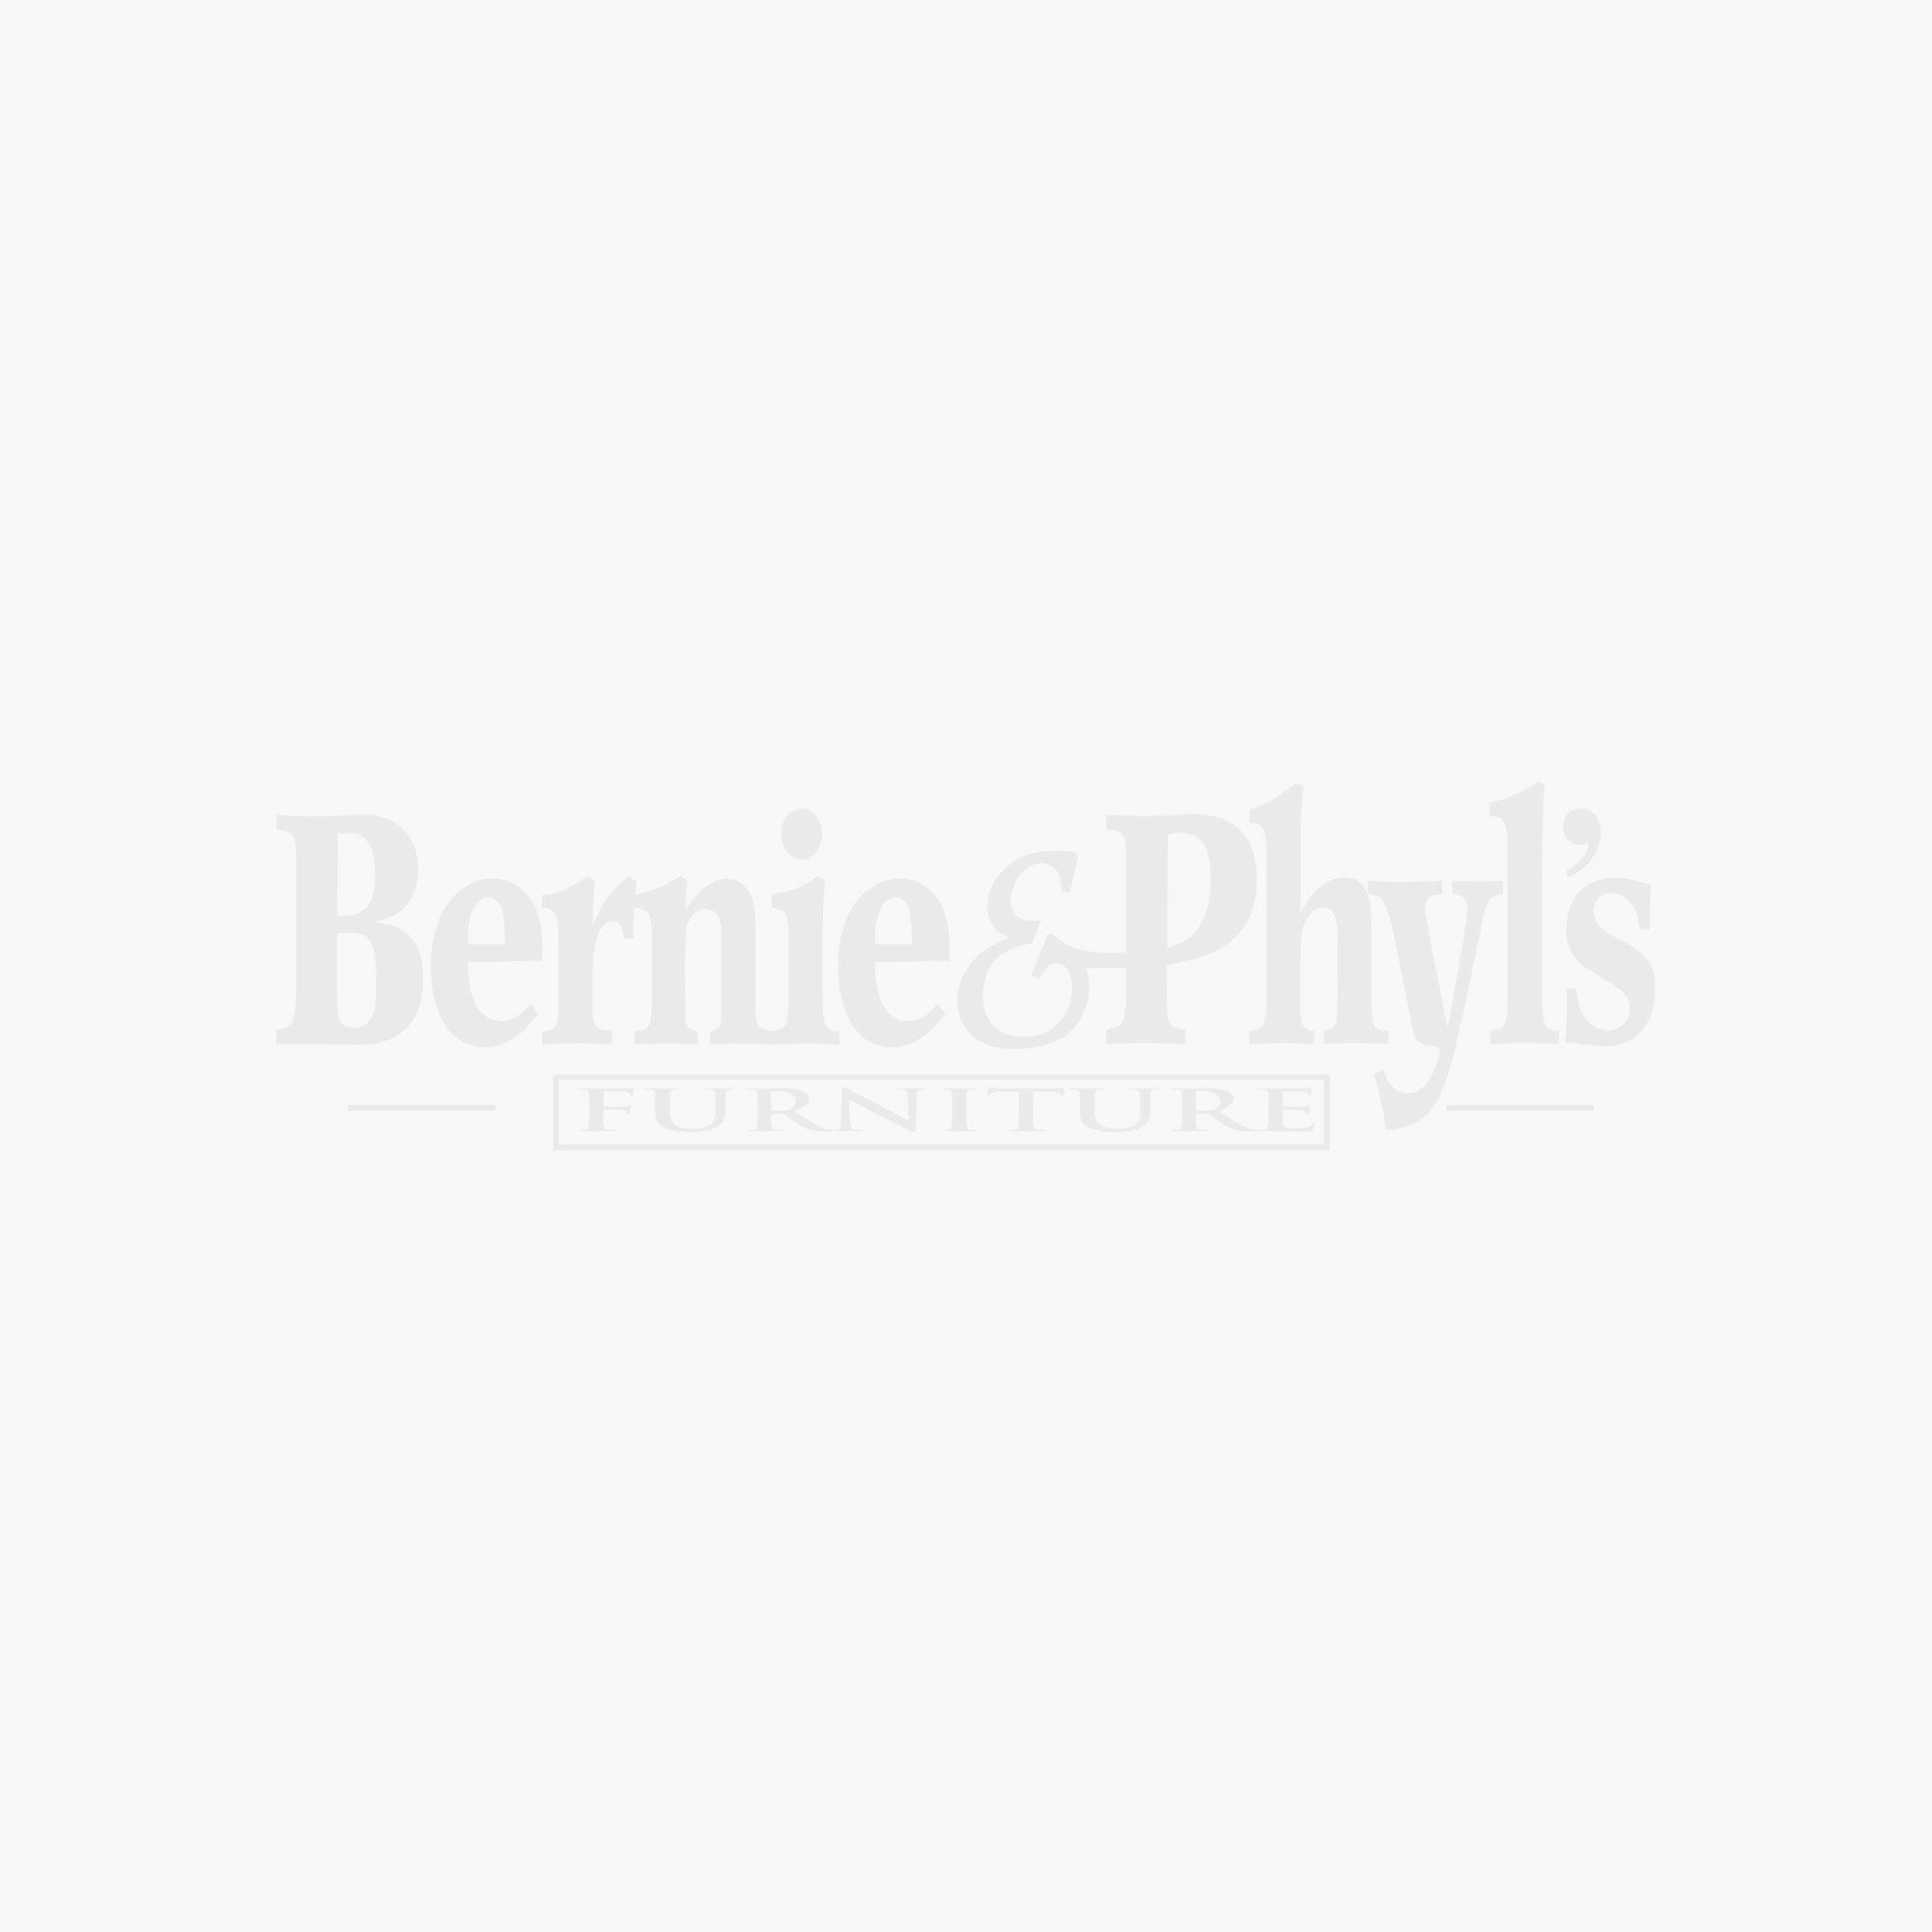 Renaburg Upholstered Barstool - Dark Brown - (Set of 2) - D574-124 by Ashley Furniture Signature Design